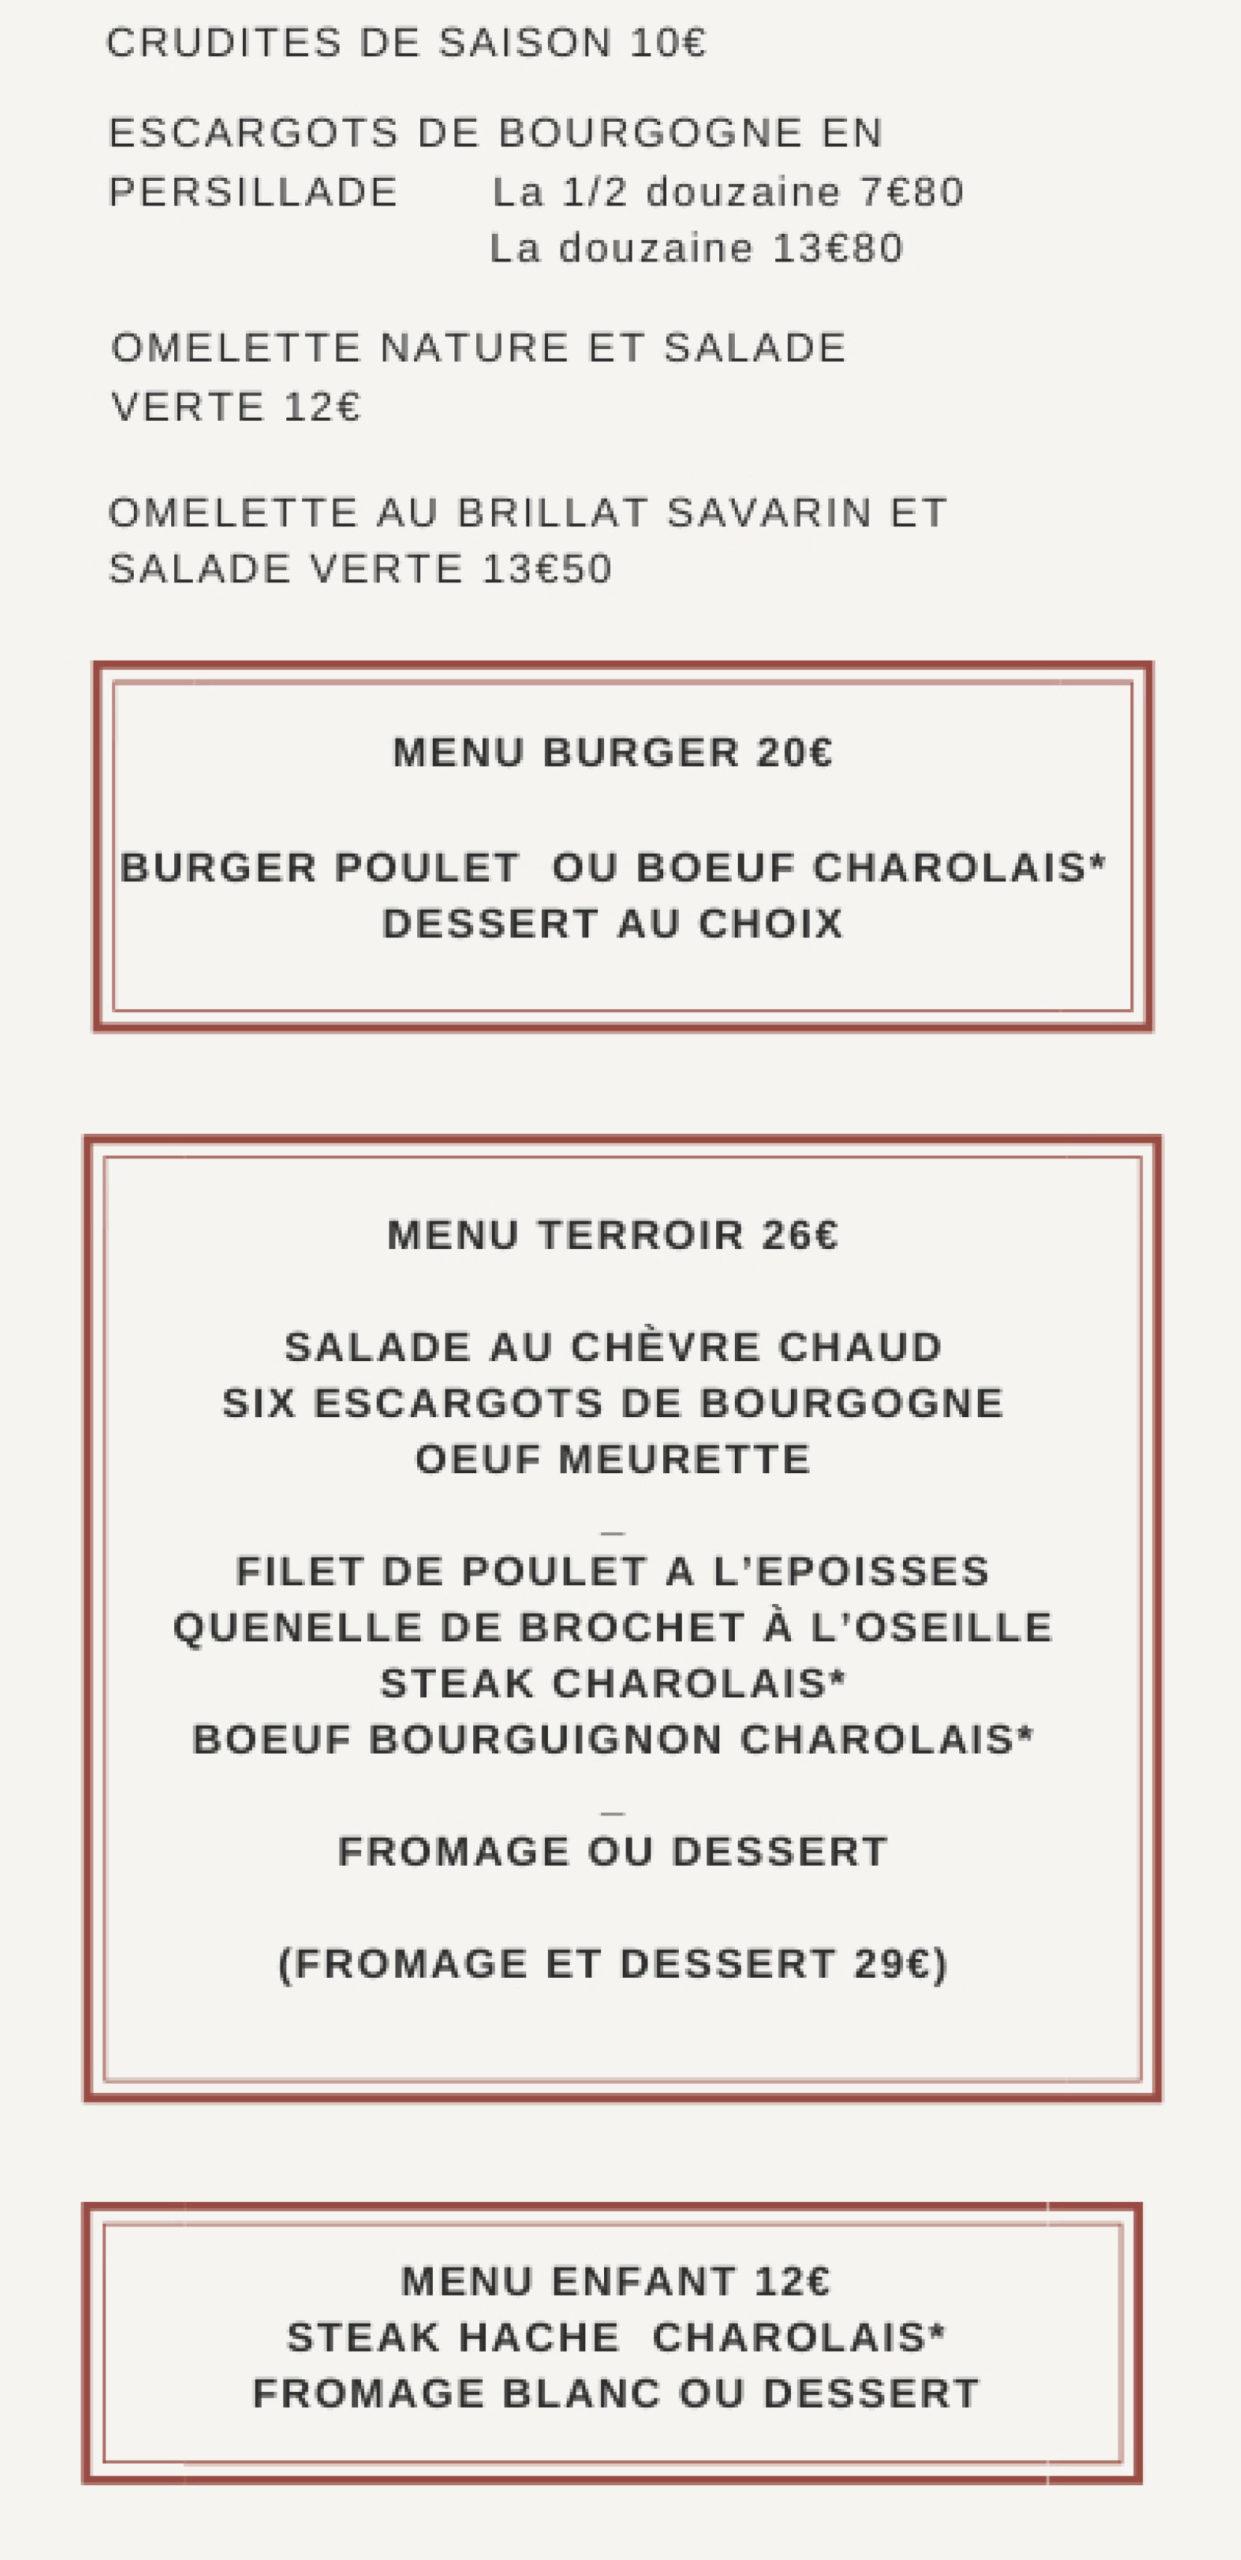 menu-halte-abbaye-arret-sur-image-1